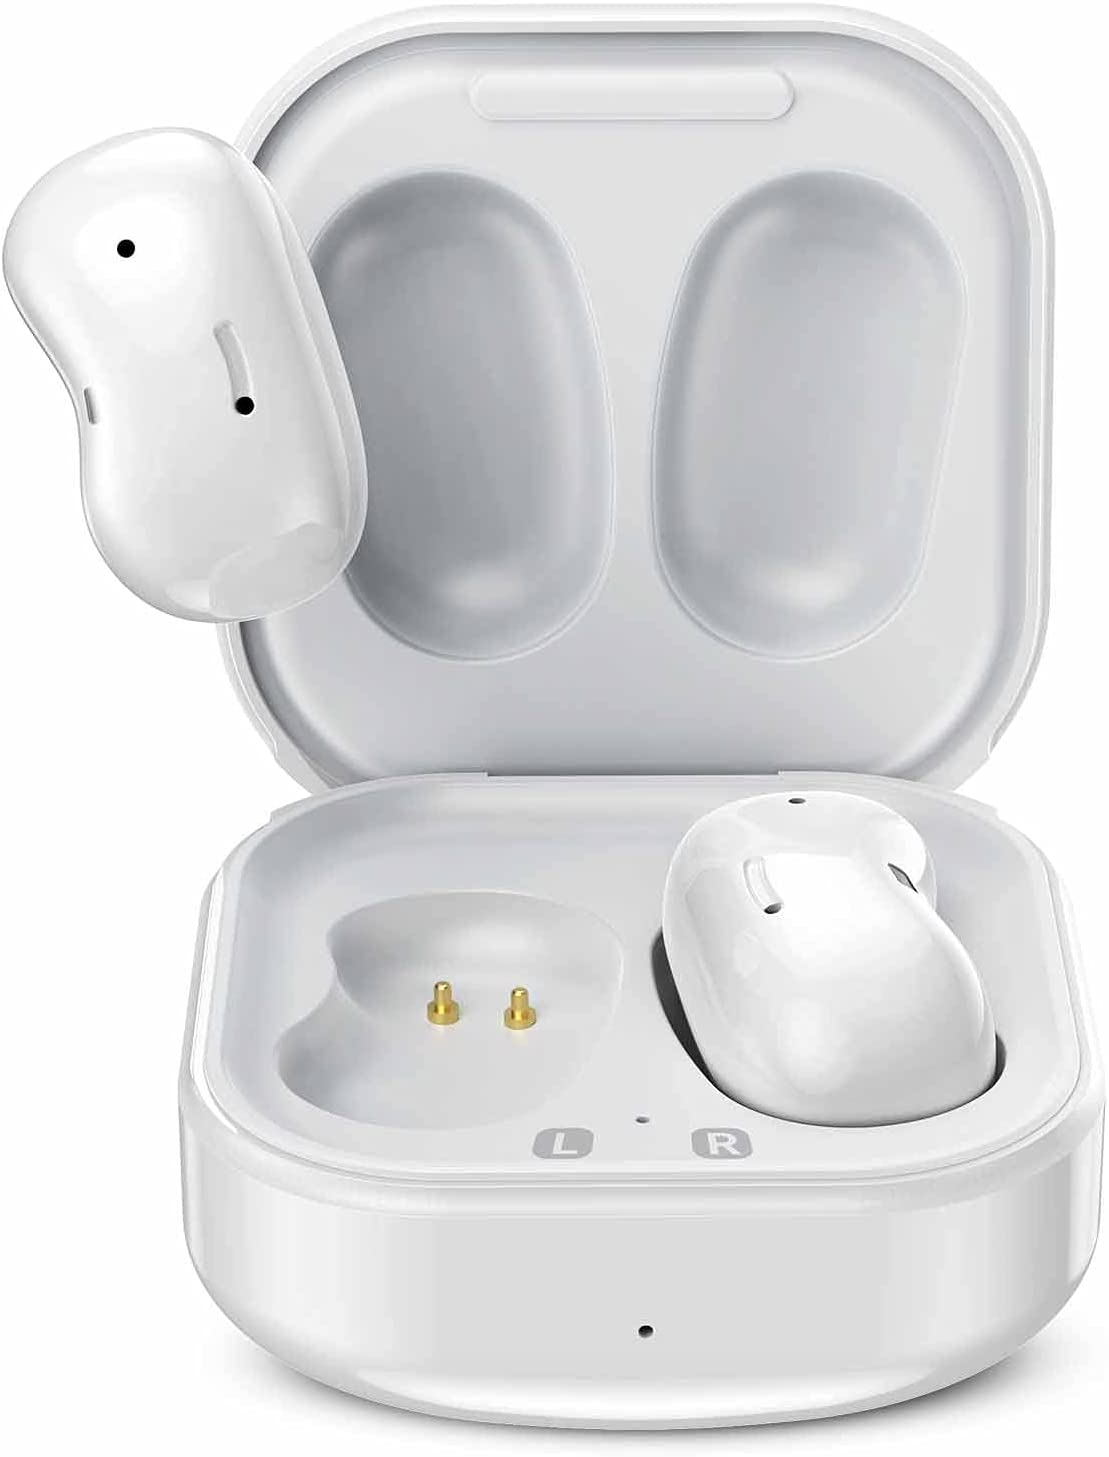 Urbanx Street Buds Live True Sale price for Leno Headphones Earbud OFFer Wireless